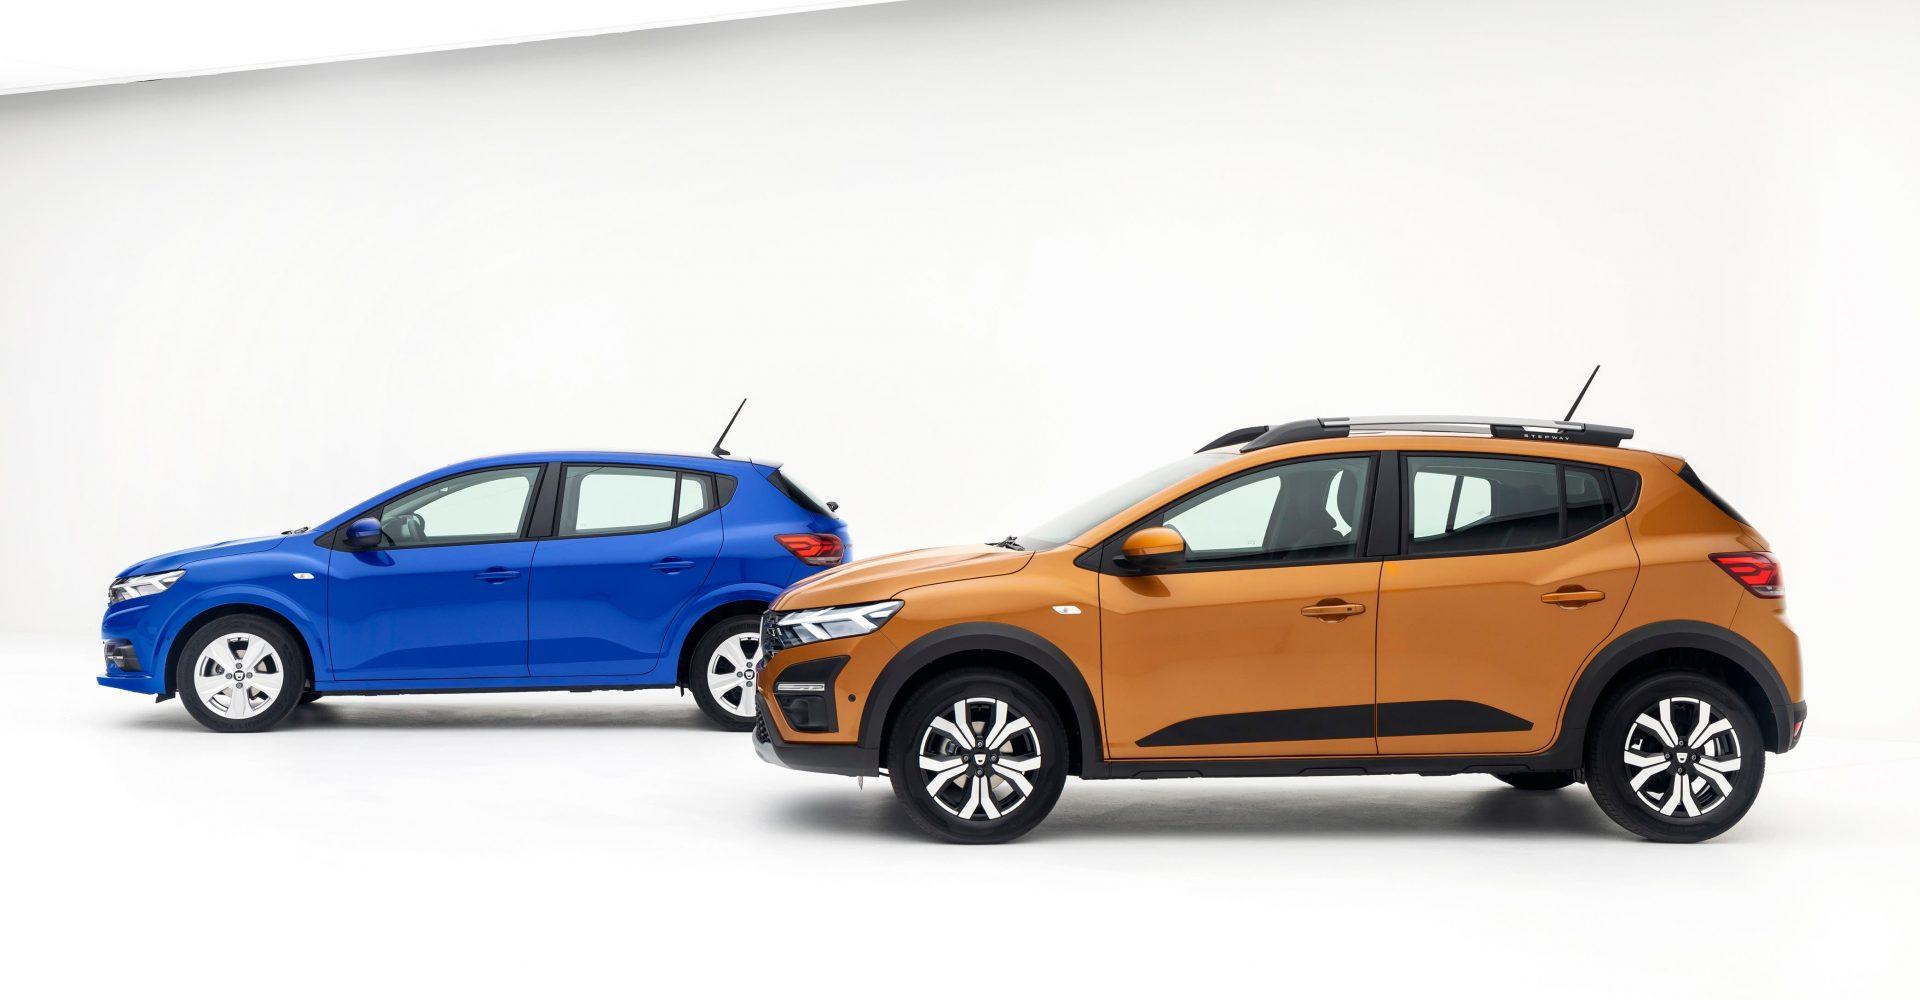 Dacia reveals updated and enhanced Sandero and Sandero Stepway